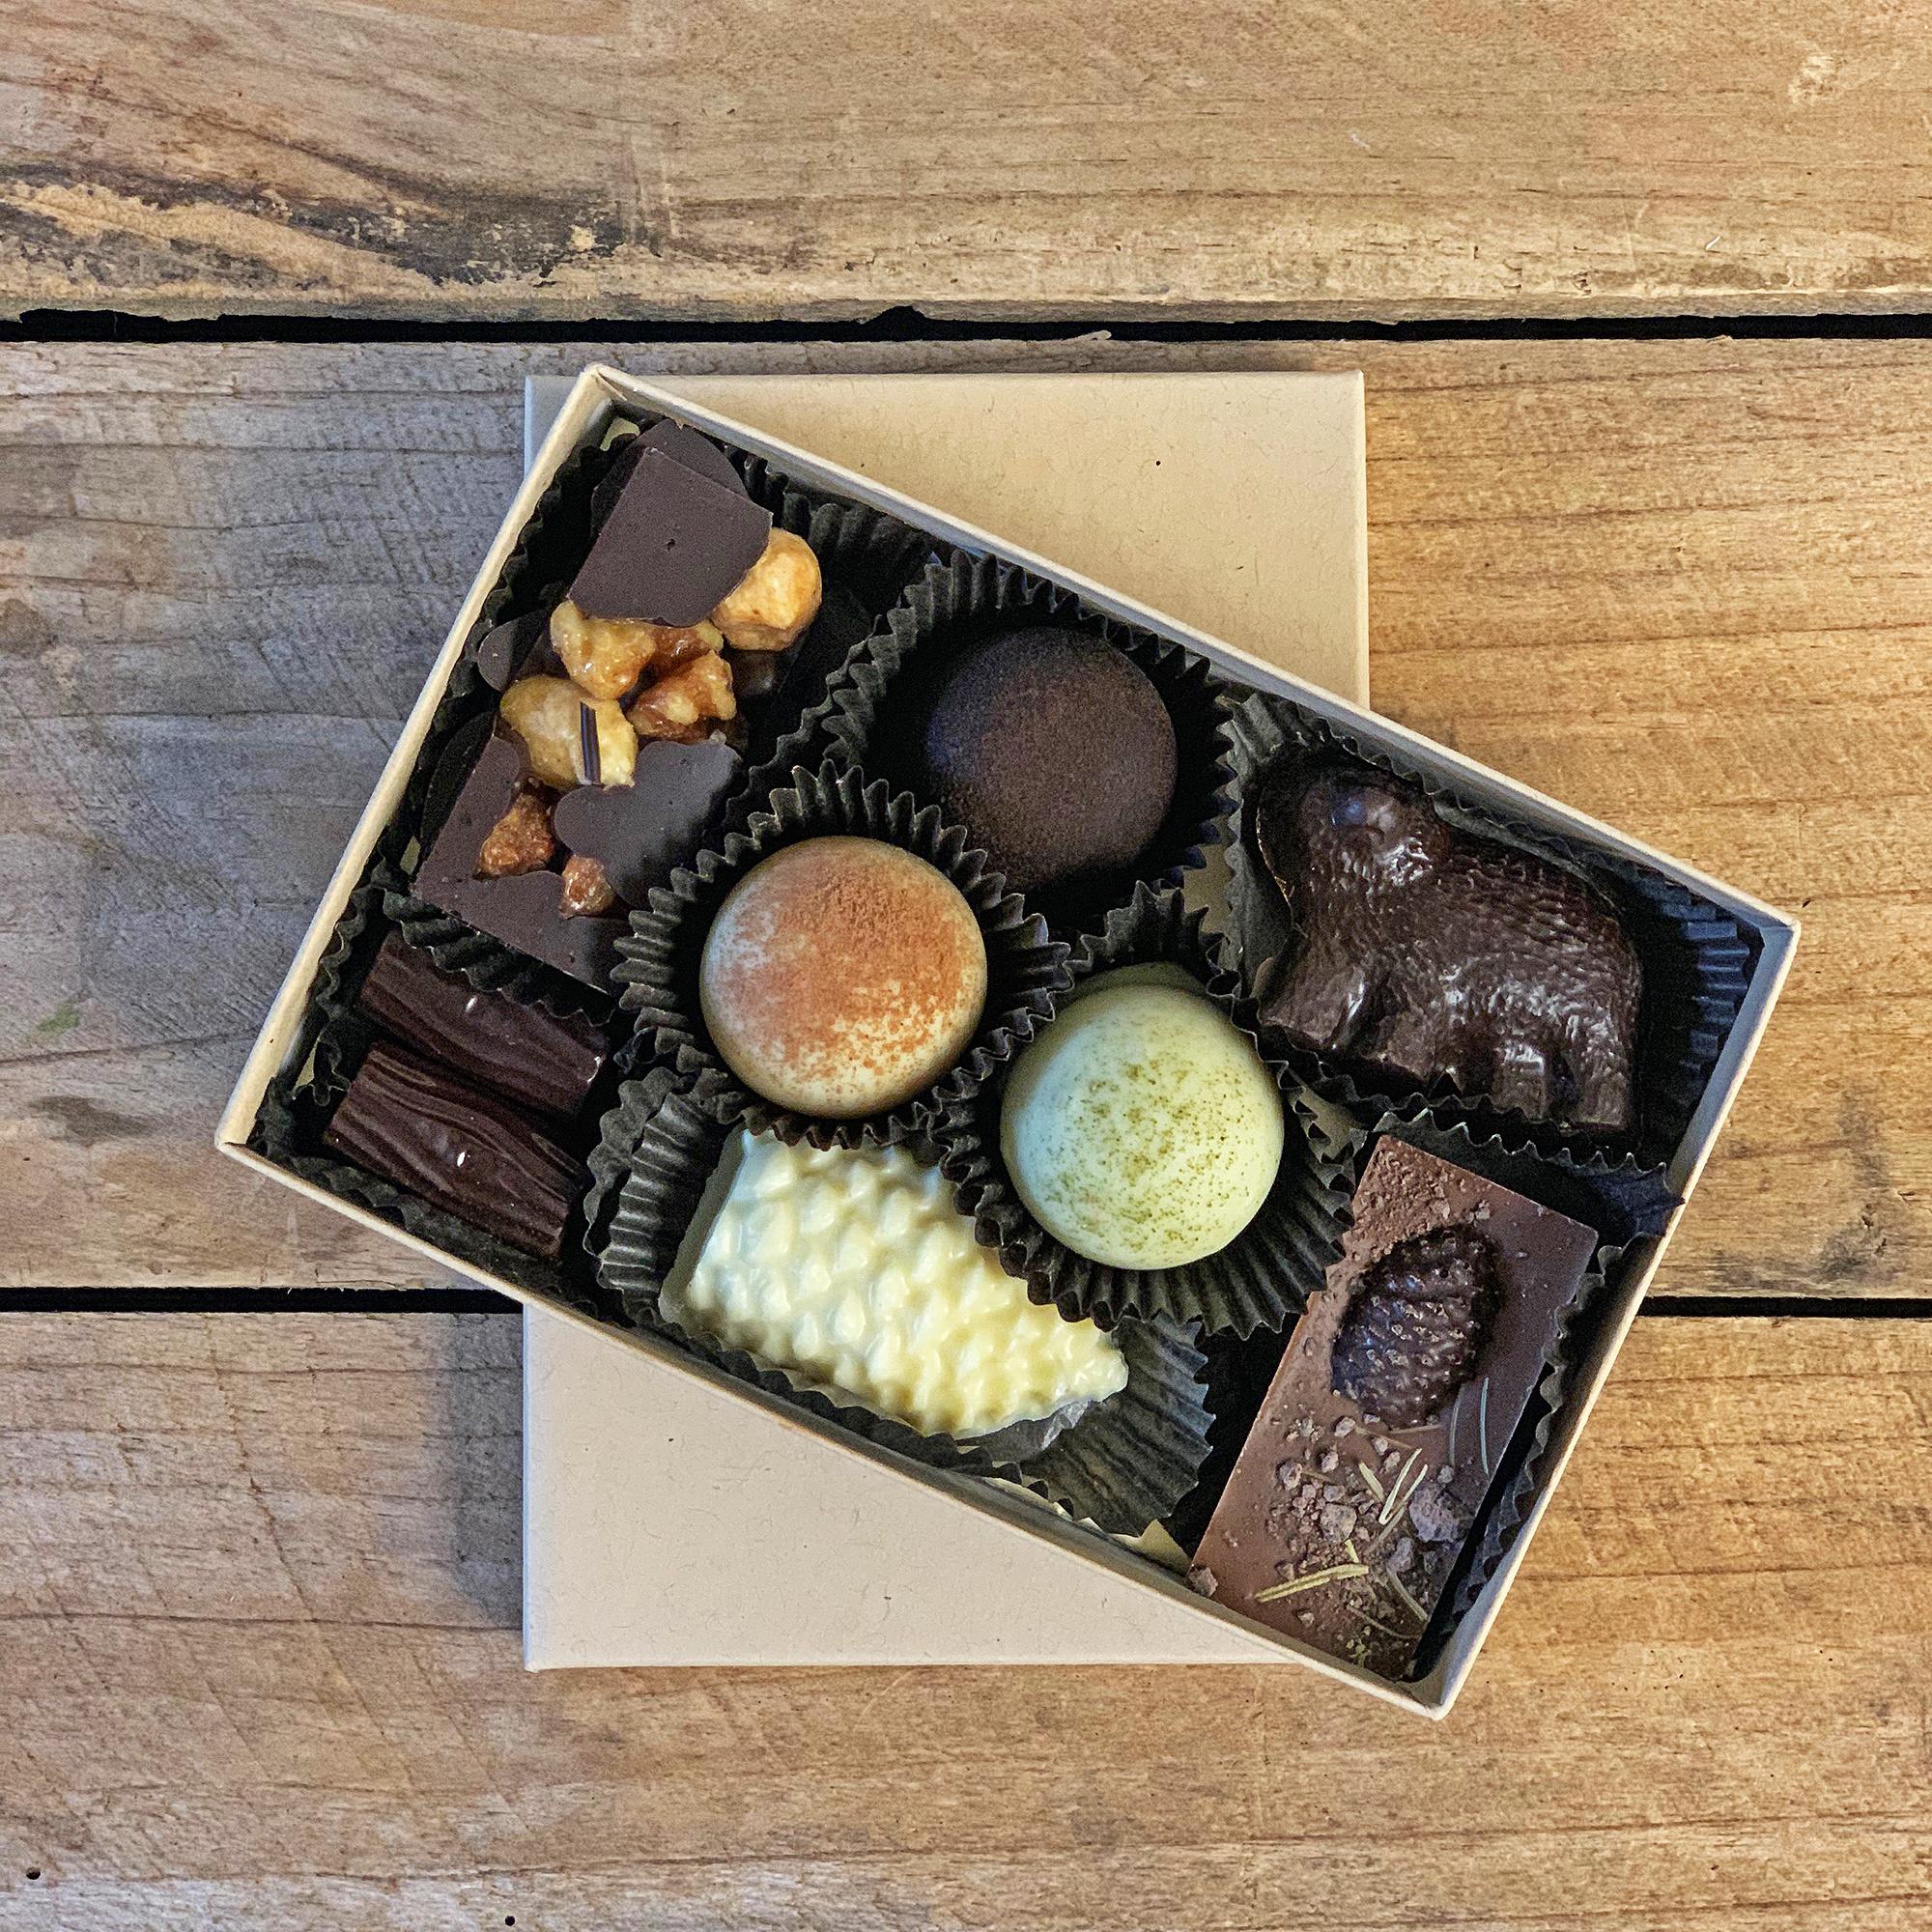 Medium Mountain Trail Bonbon Collection. Box features 8 bonbons in various sizes.